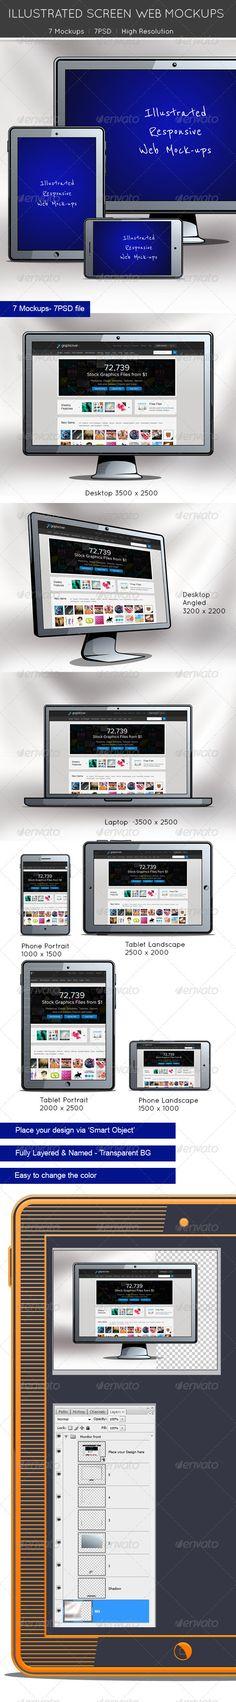 Illustrated Screen Web Mockups